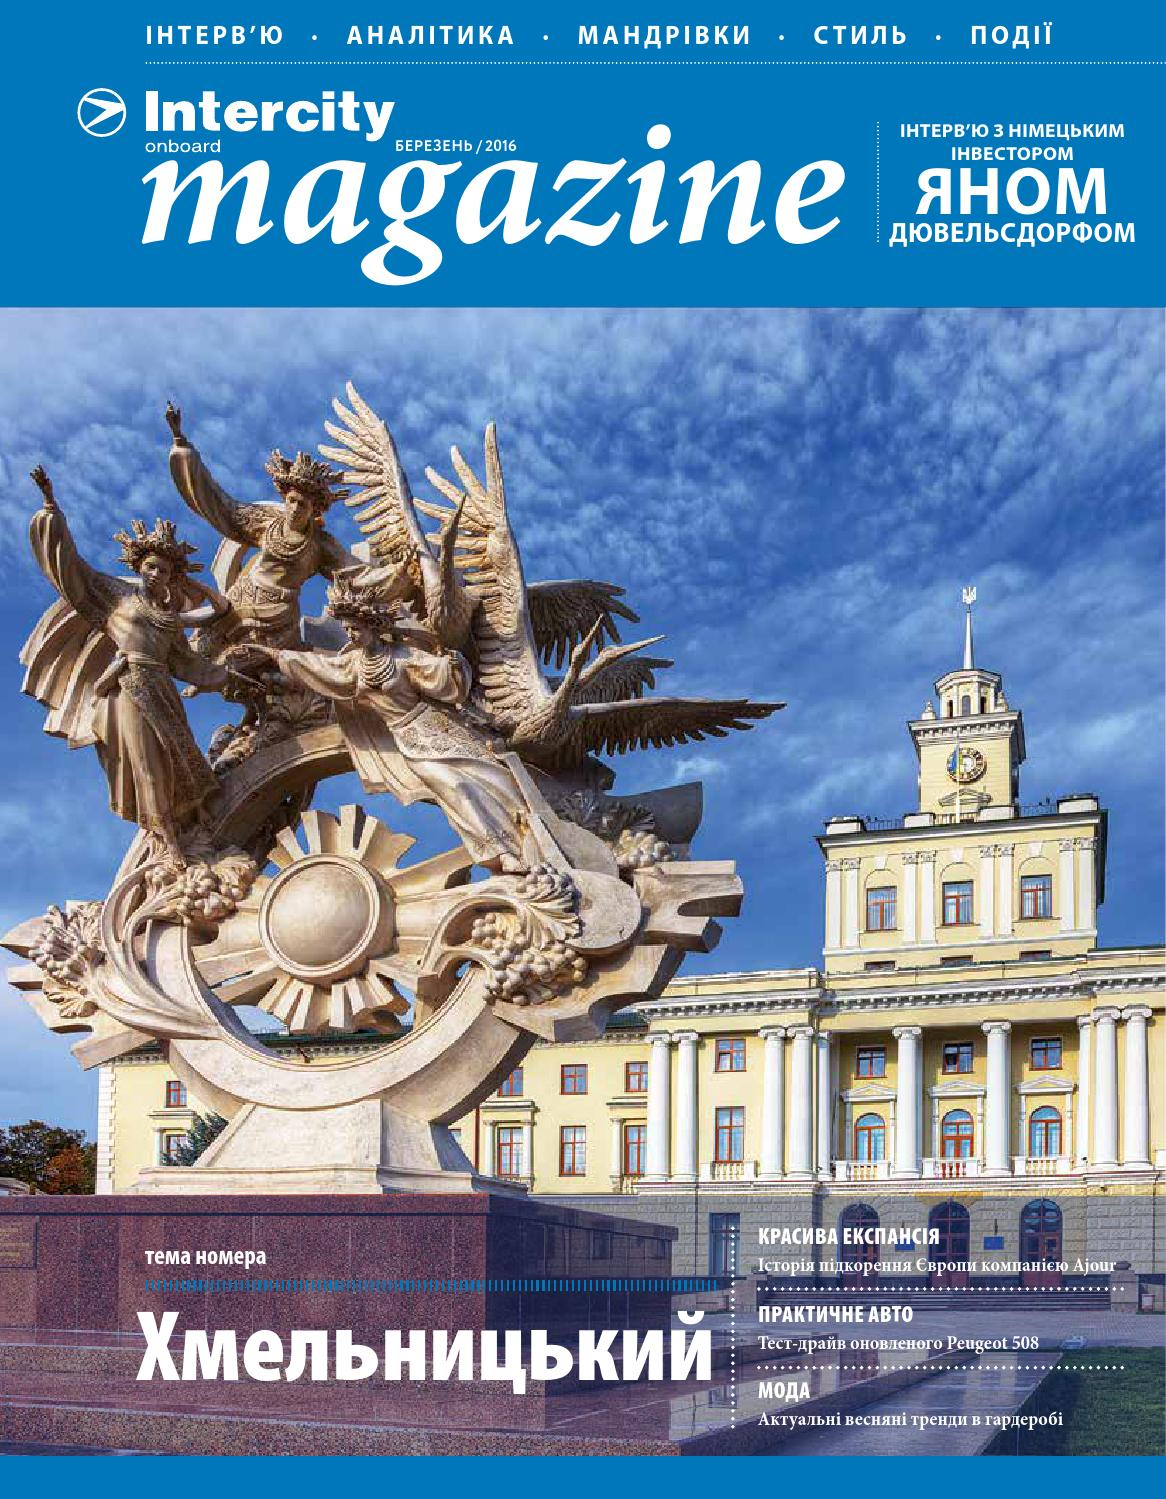 b1961b3b357731 Intercity onboard magazine березень/2016 by ICOM - issuu